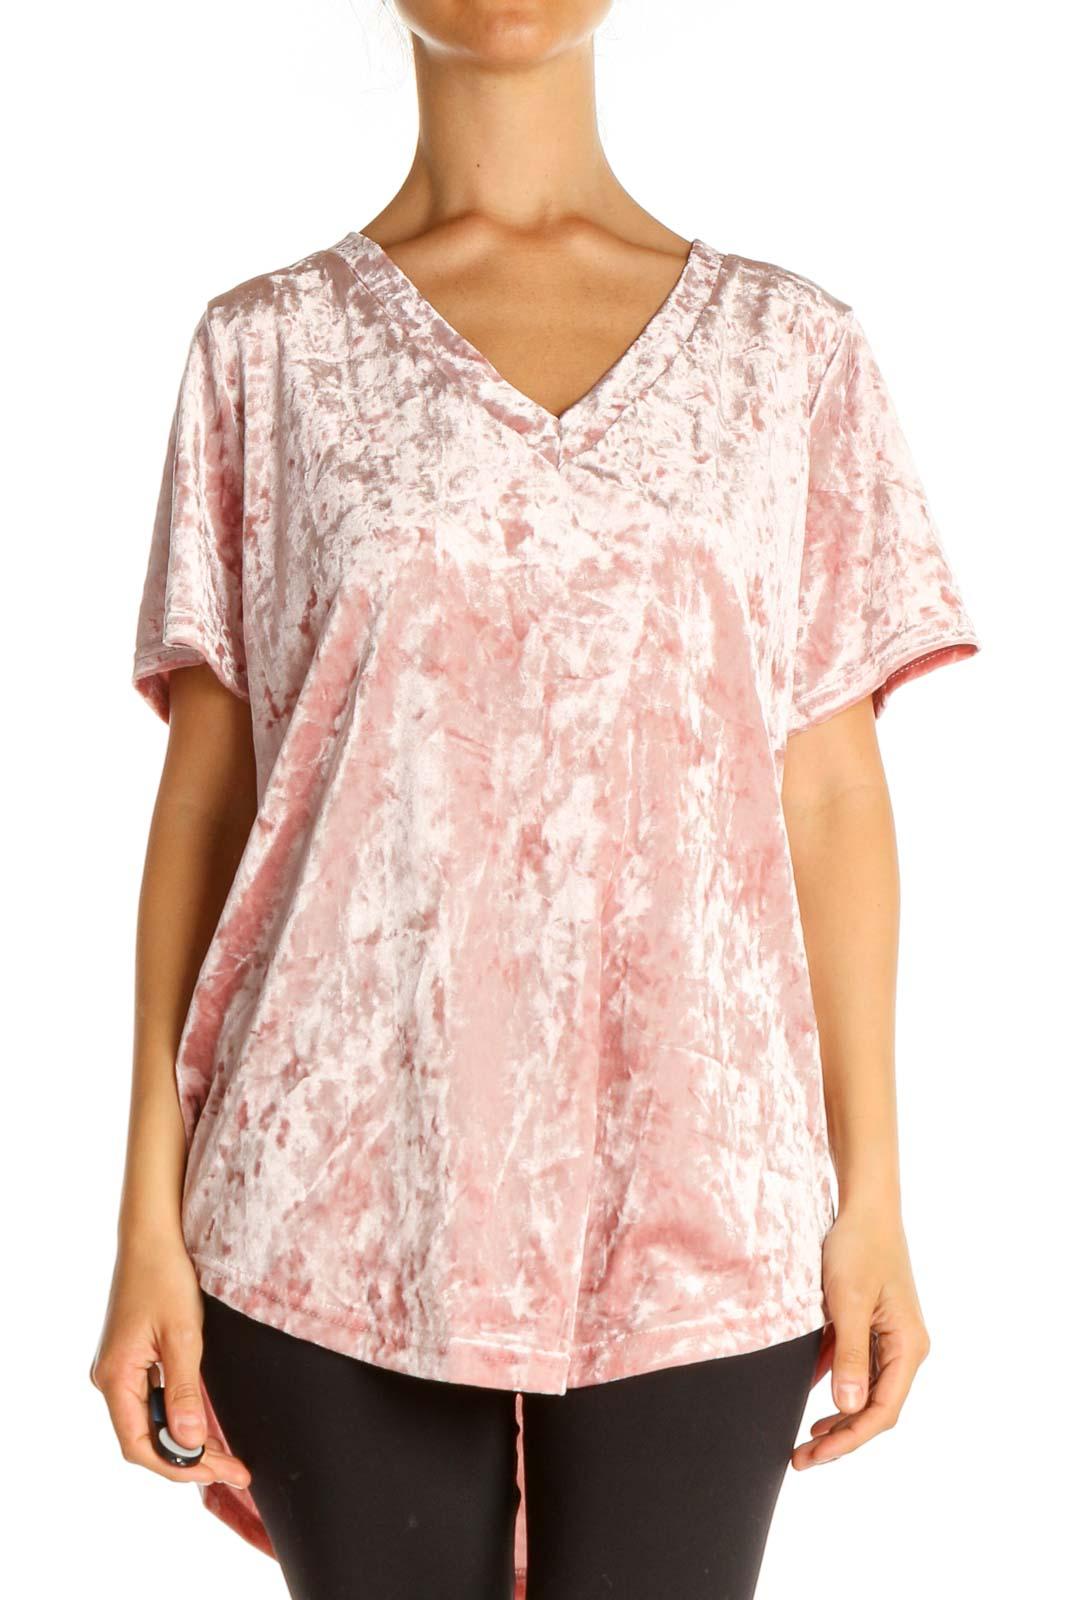 Pink Textured Brunch Blouse Front